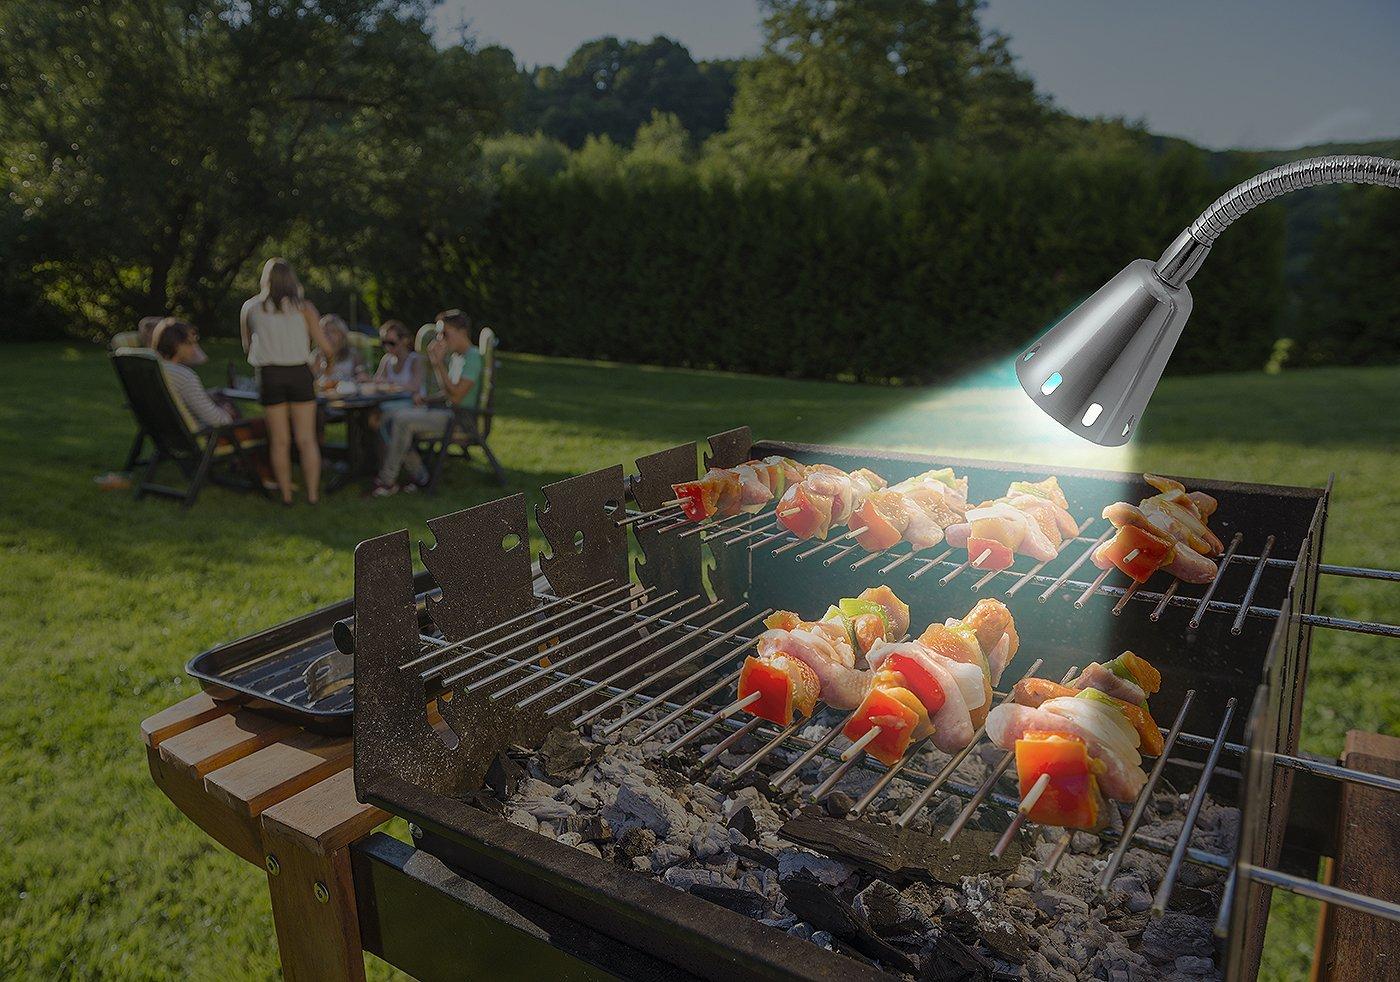 new led concepts bbq grill light 12 super bright outdoor. Black Bedroom Furniture Sets. Home Design Ideas